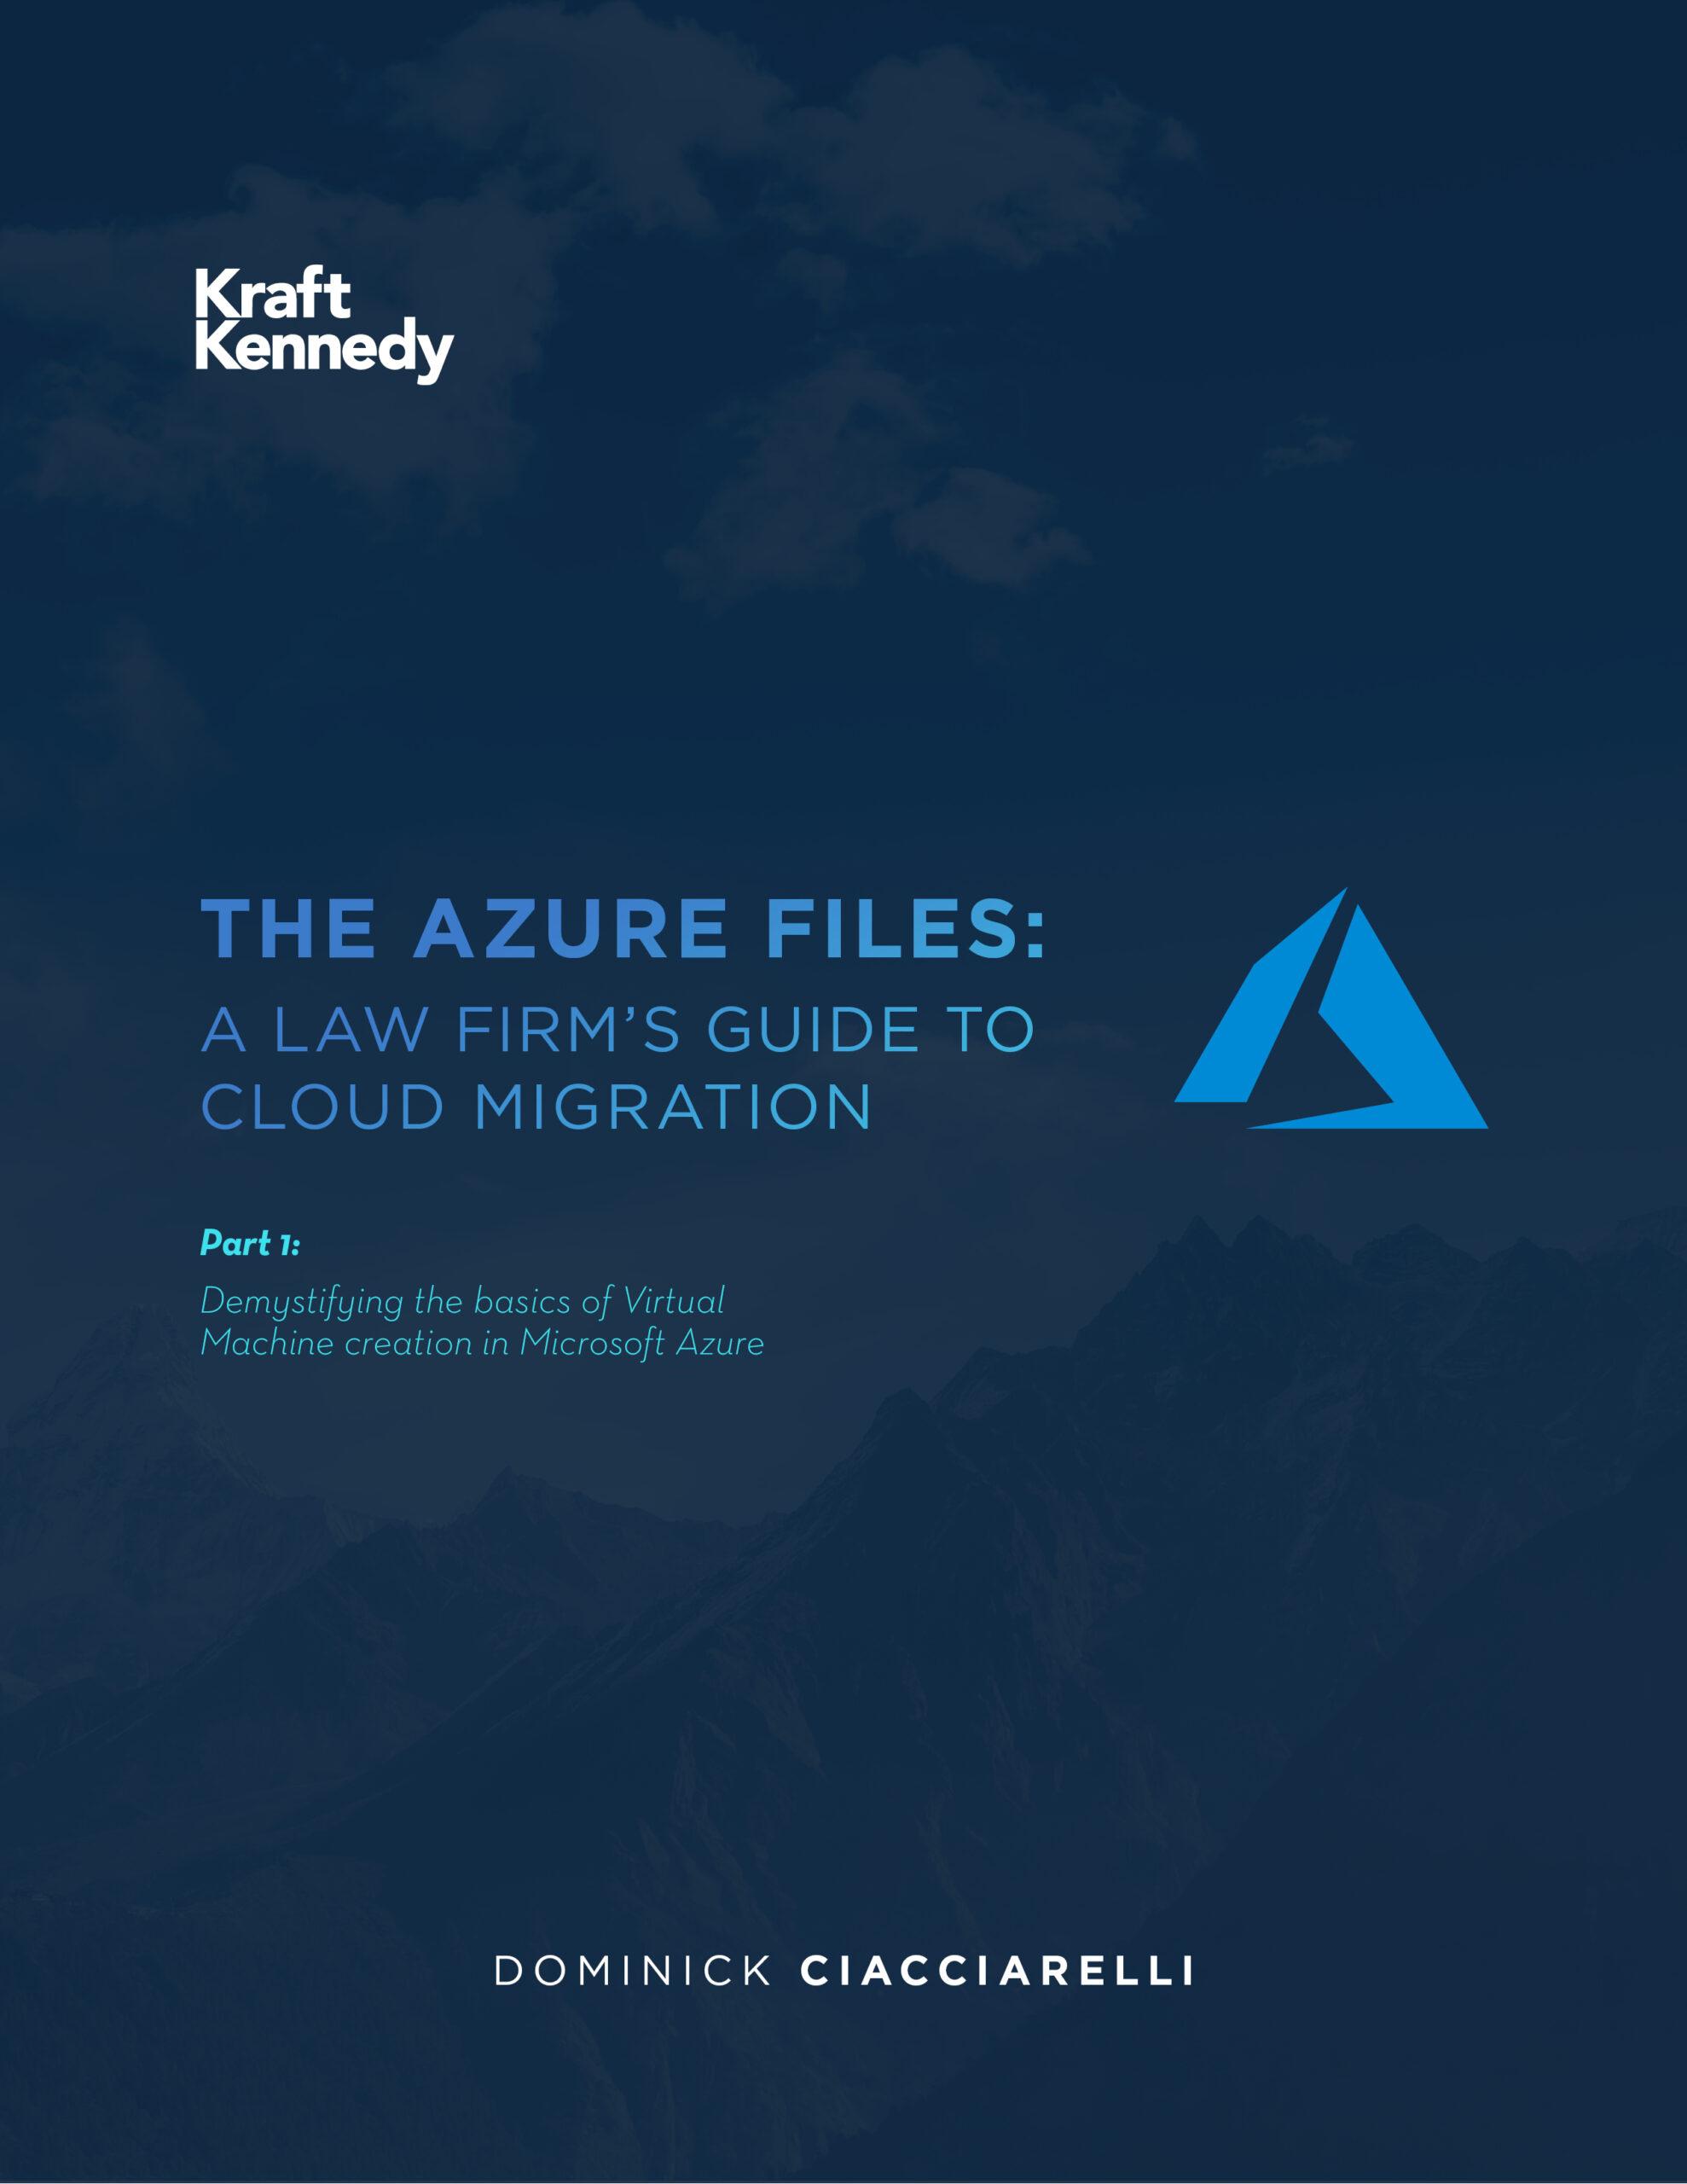 Kraft Kennedy - The Azure Files - Part 1 - Basics of VM Creation